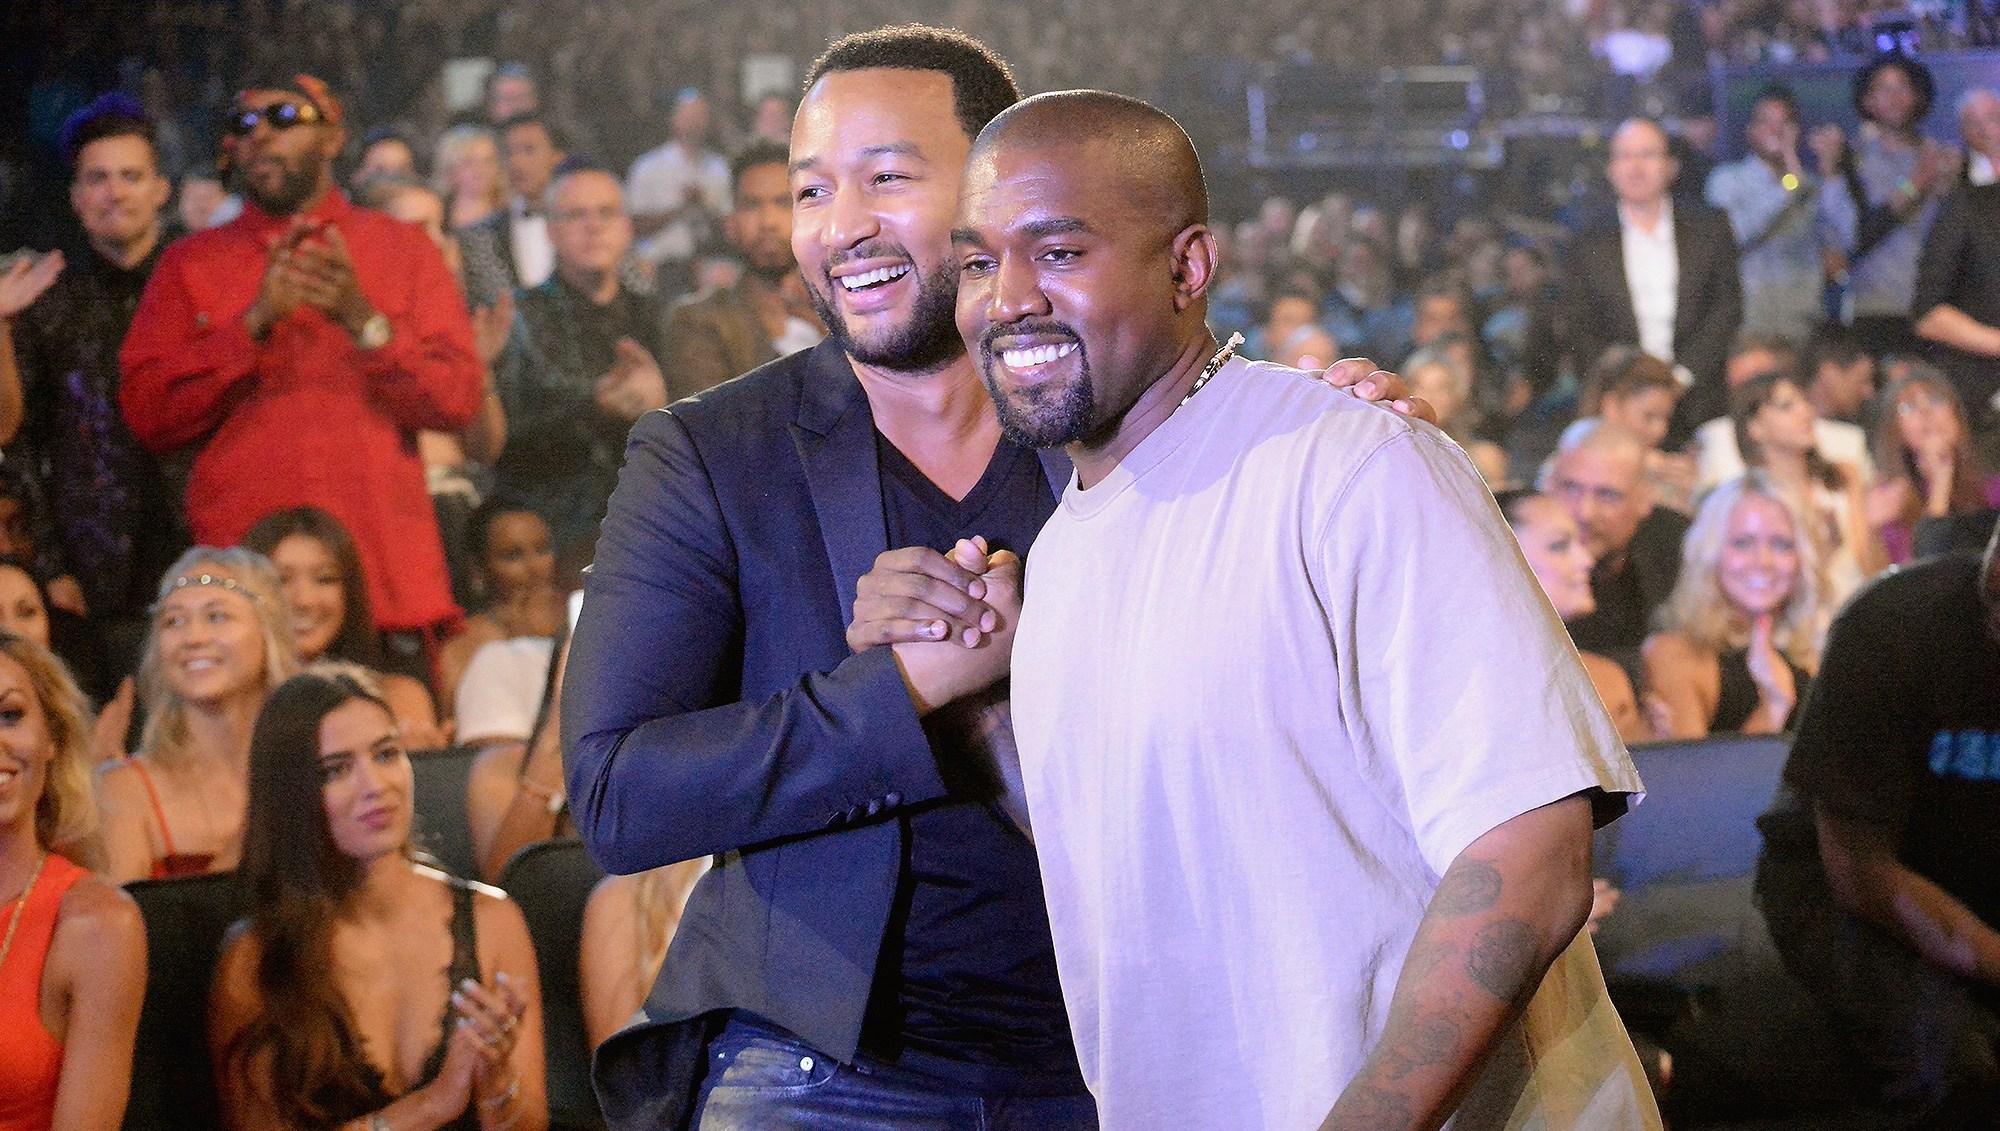 John Legend, Kanye West, New Singles, Music, Twitter, Donald Trump